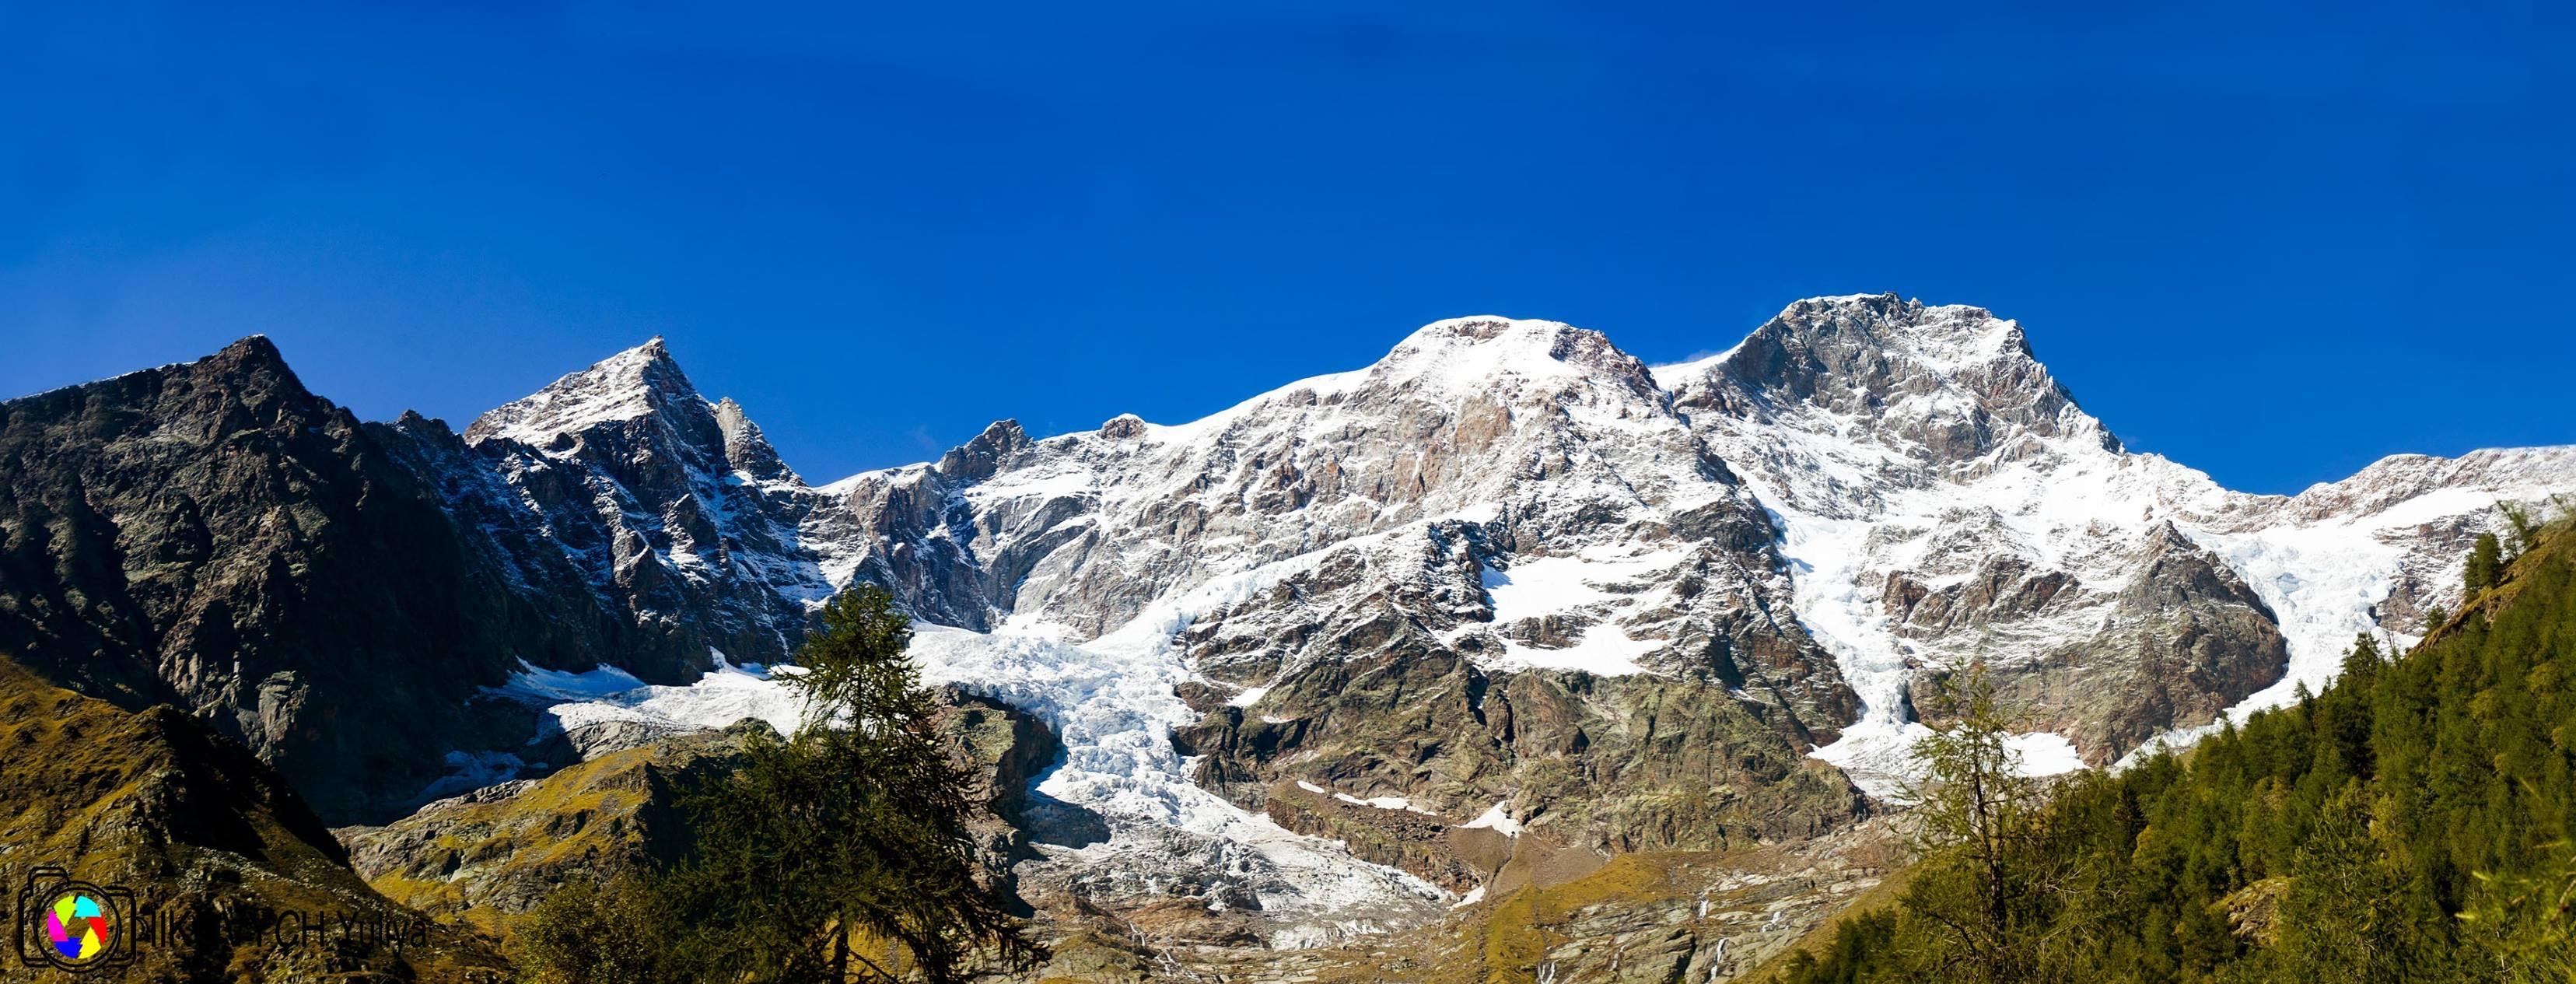 Gray and White Mountains